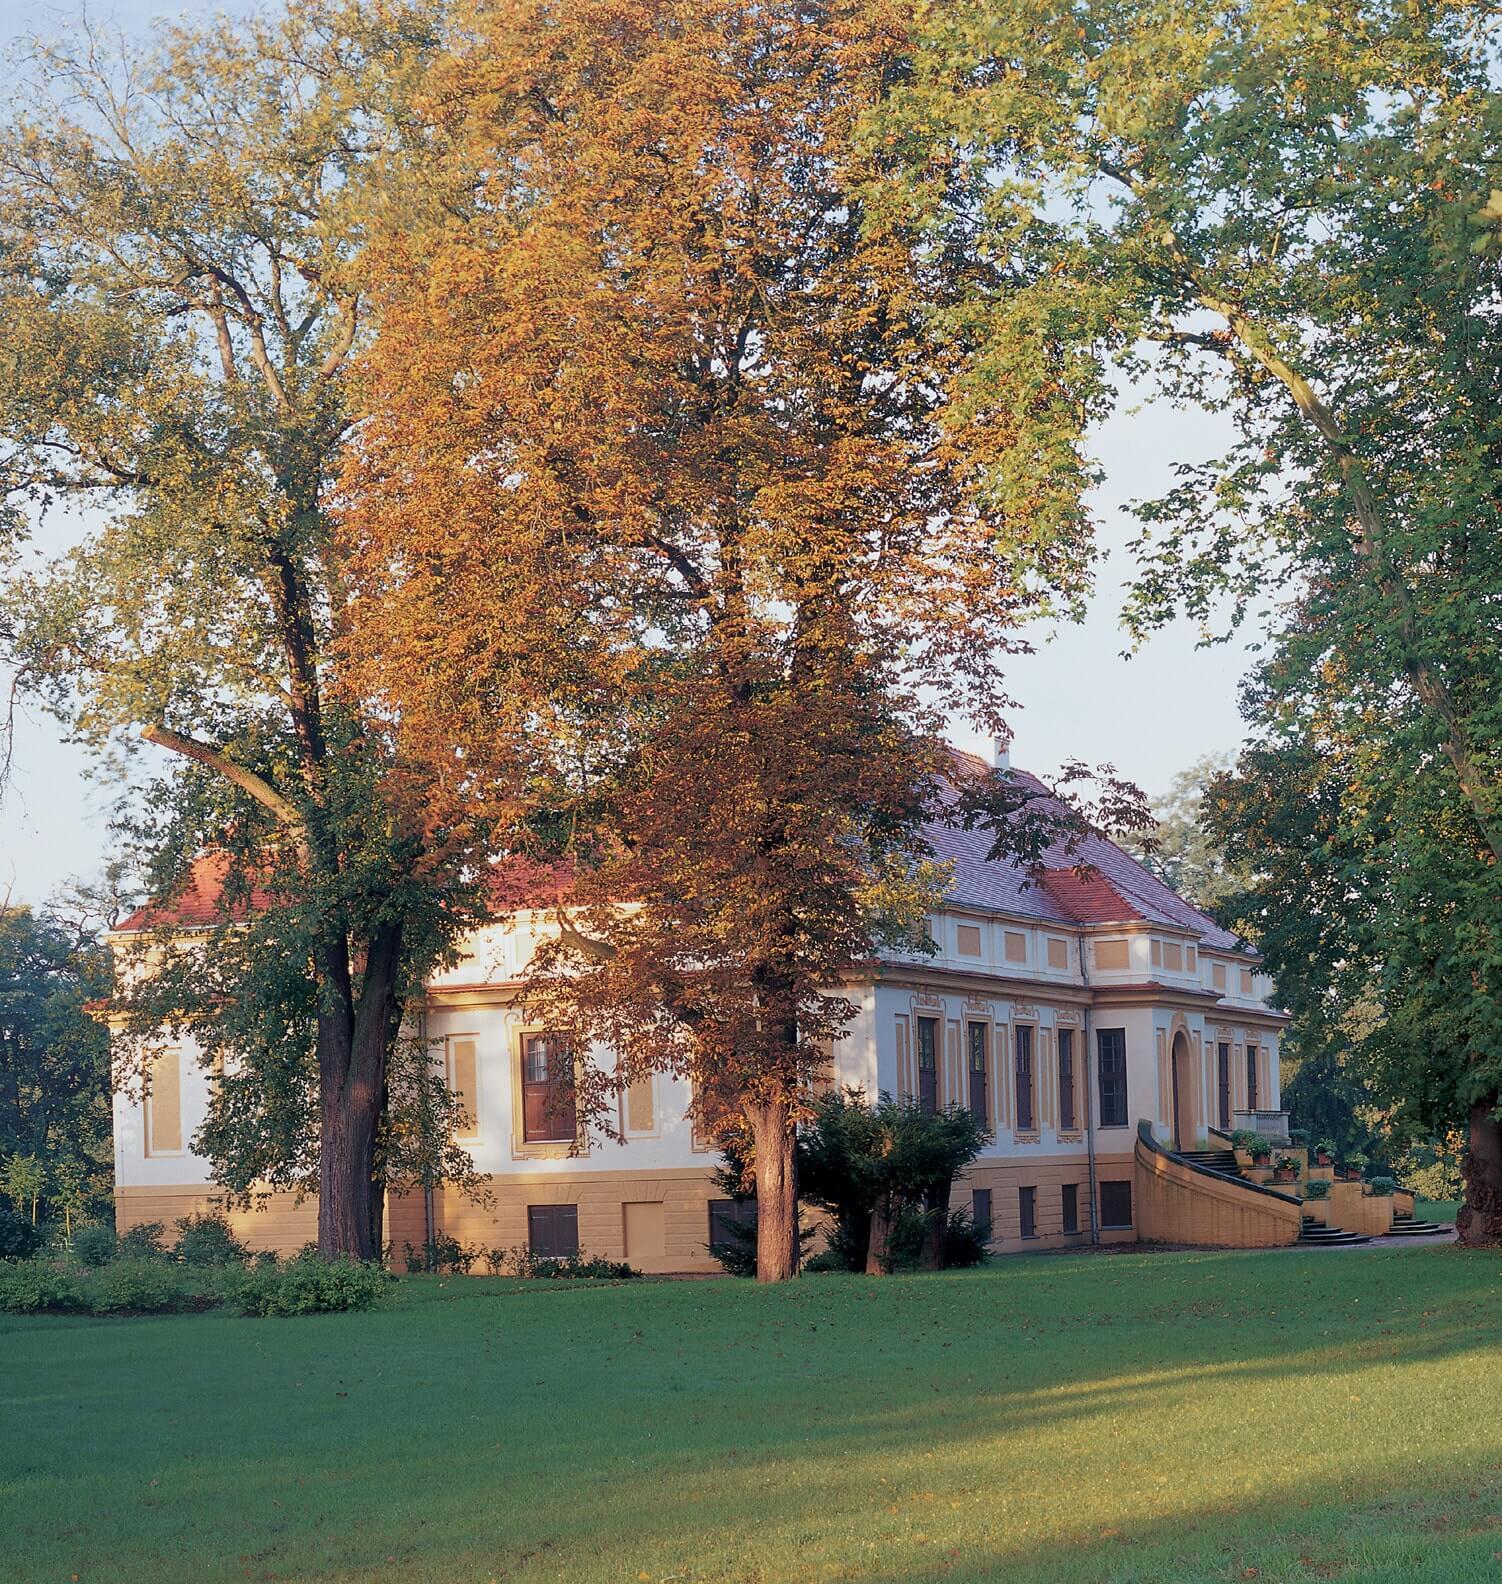 Schloss und Schlossgarten Caputh